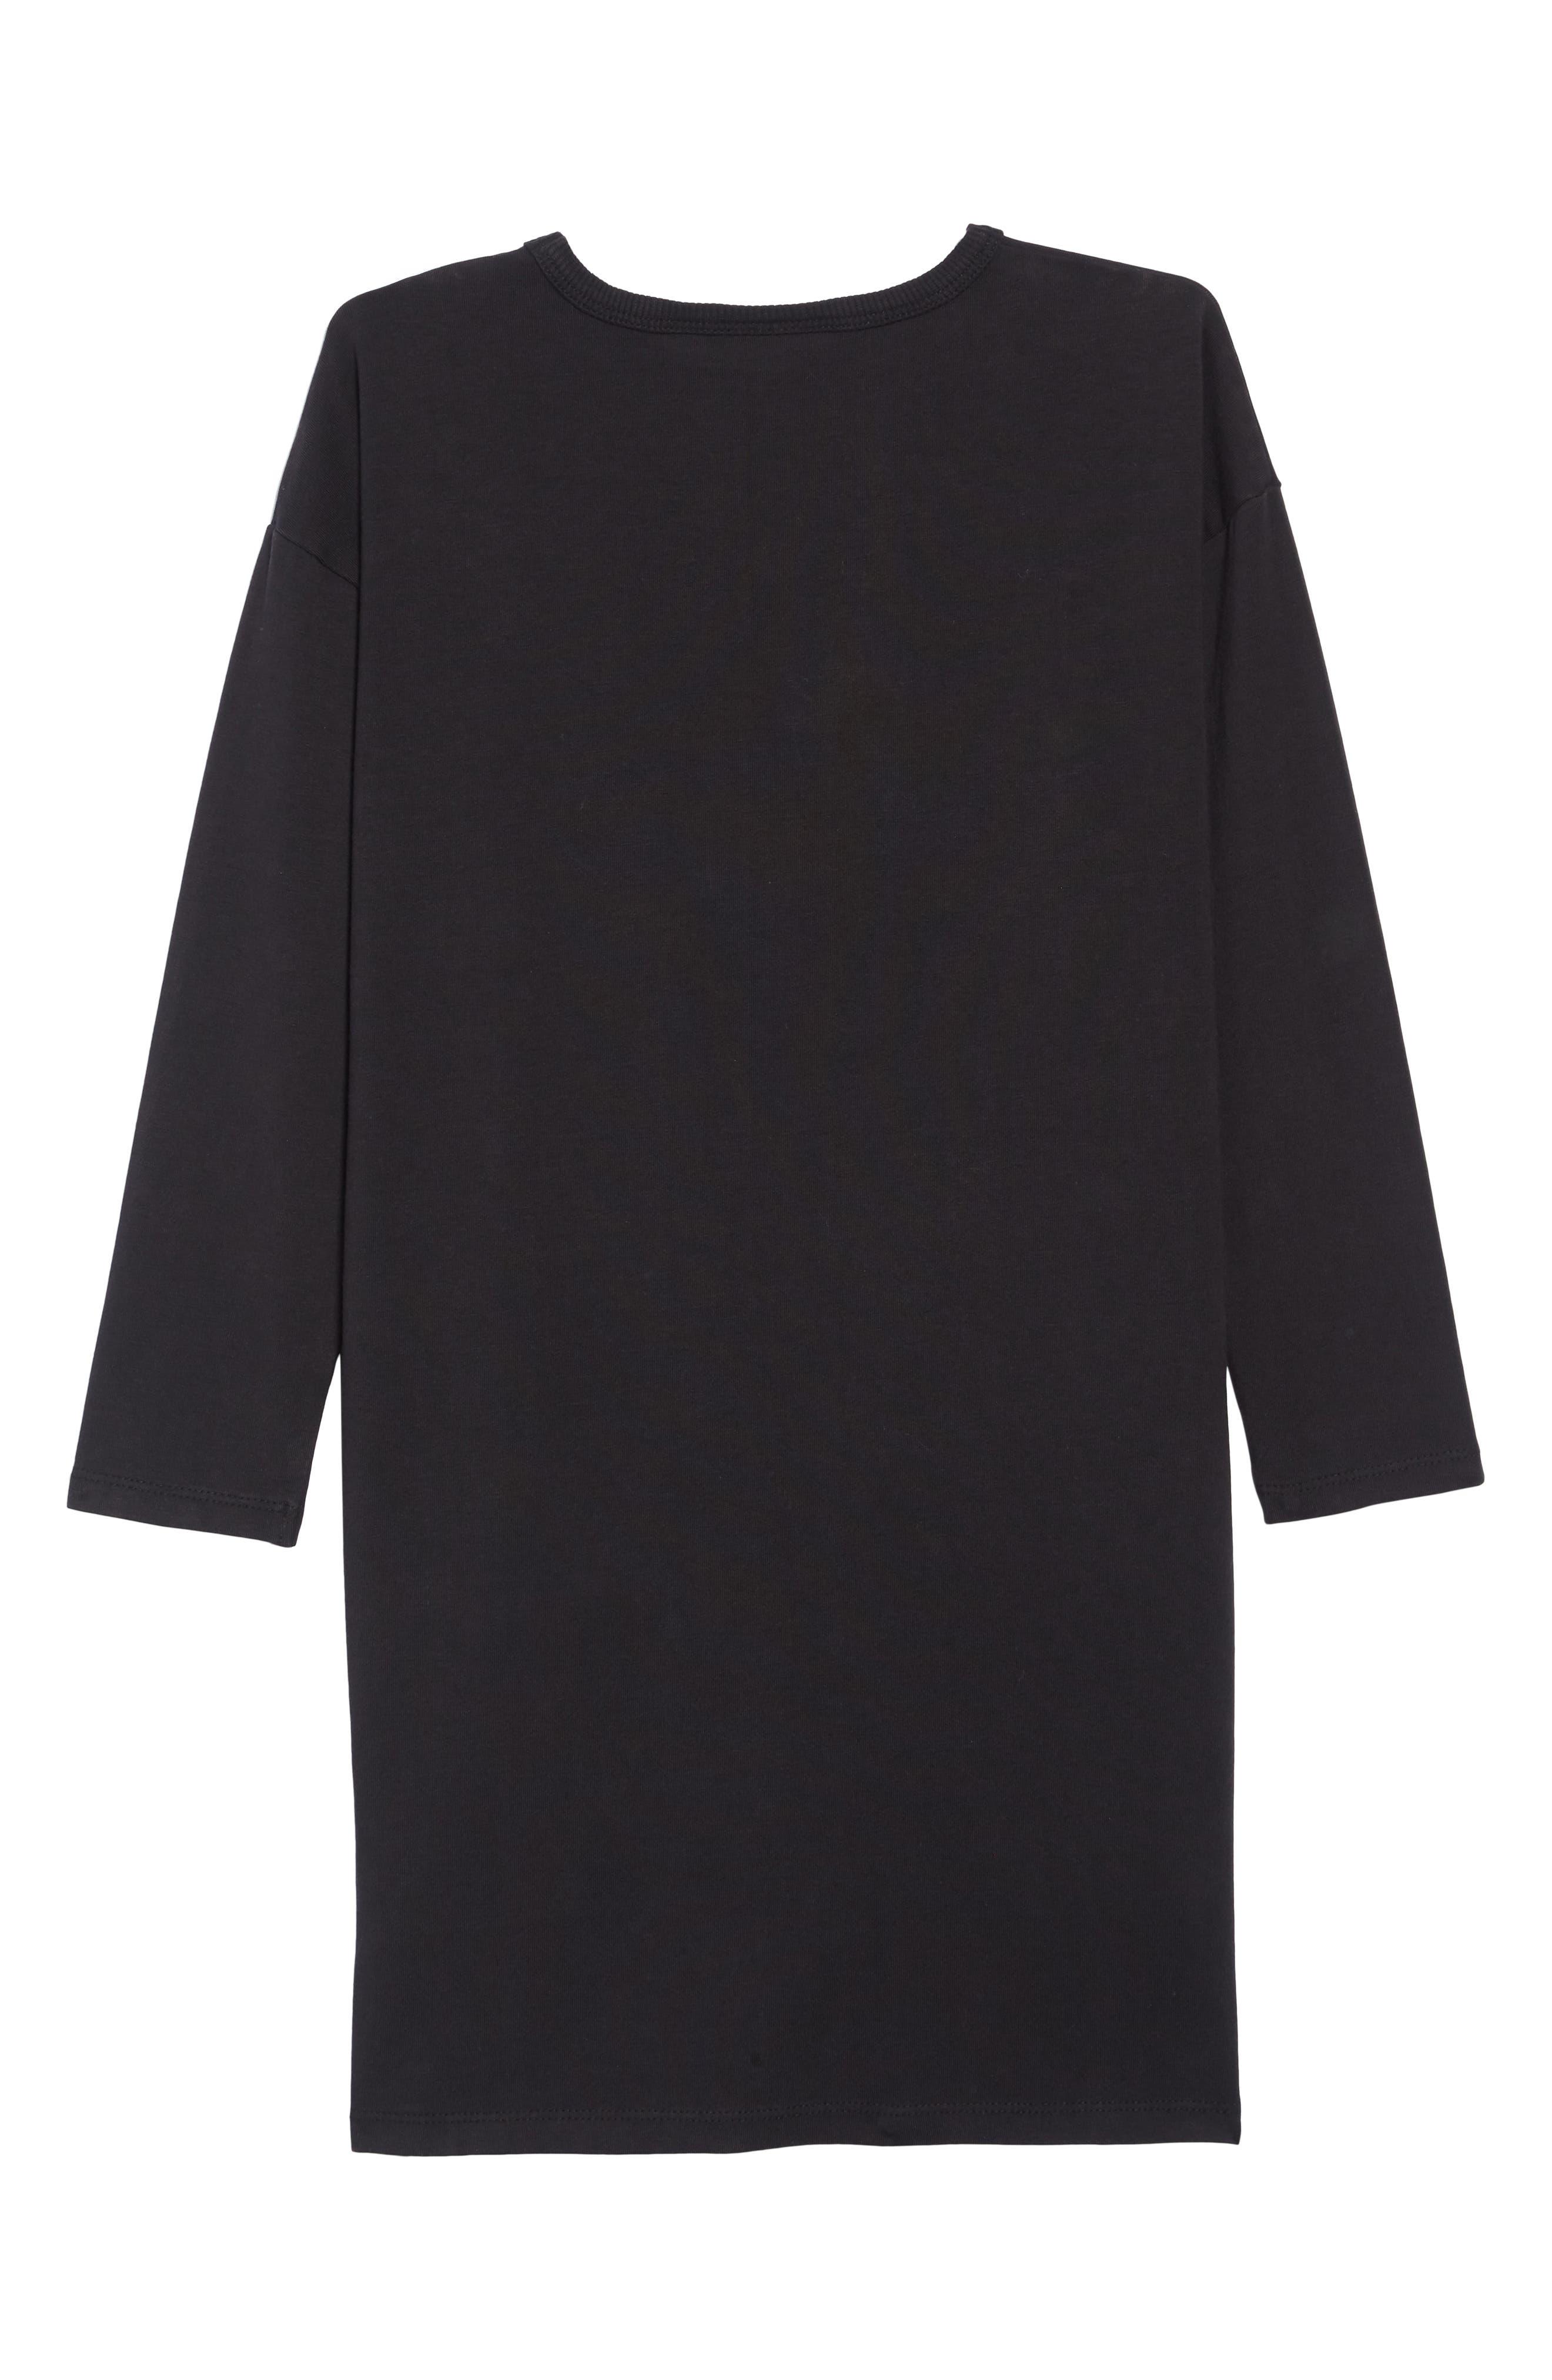 Your Love T-Shirt Dress,                             Alternate thumbnail 2, color,                             BLACK